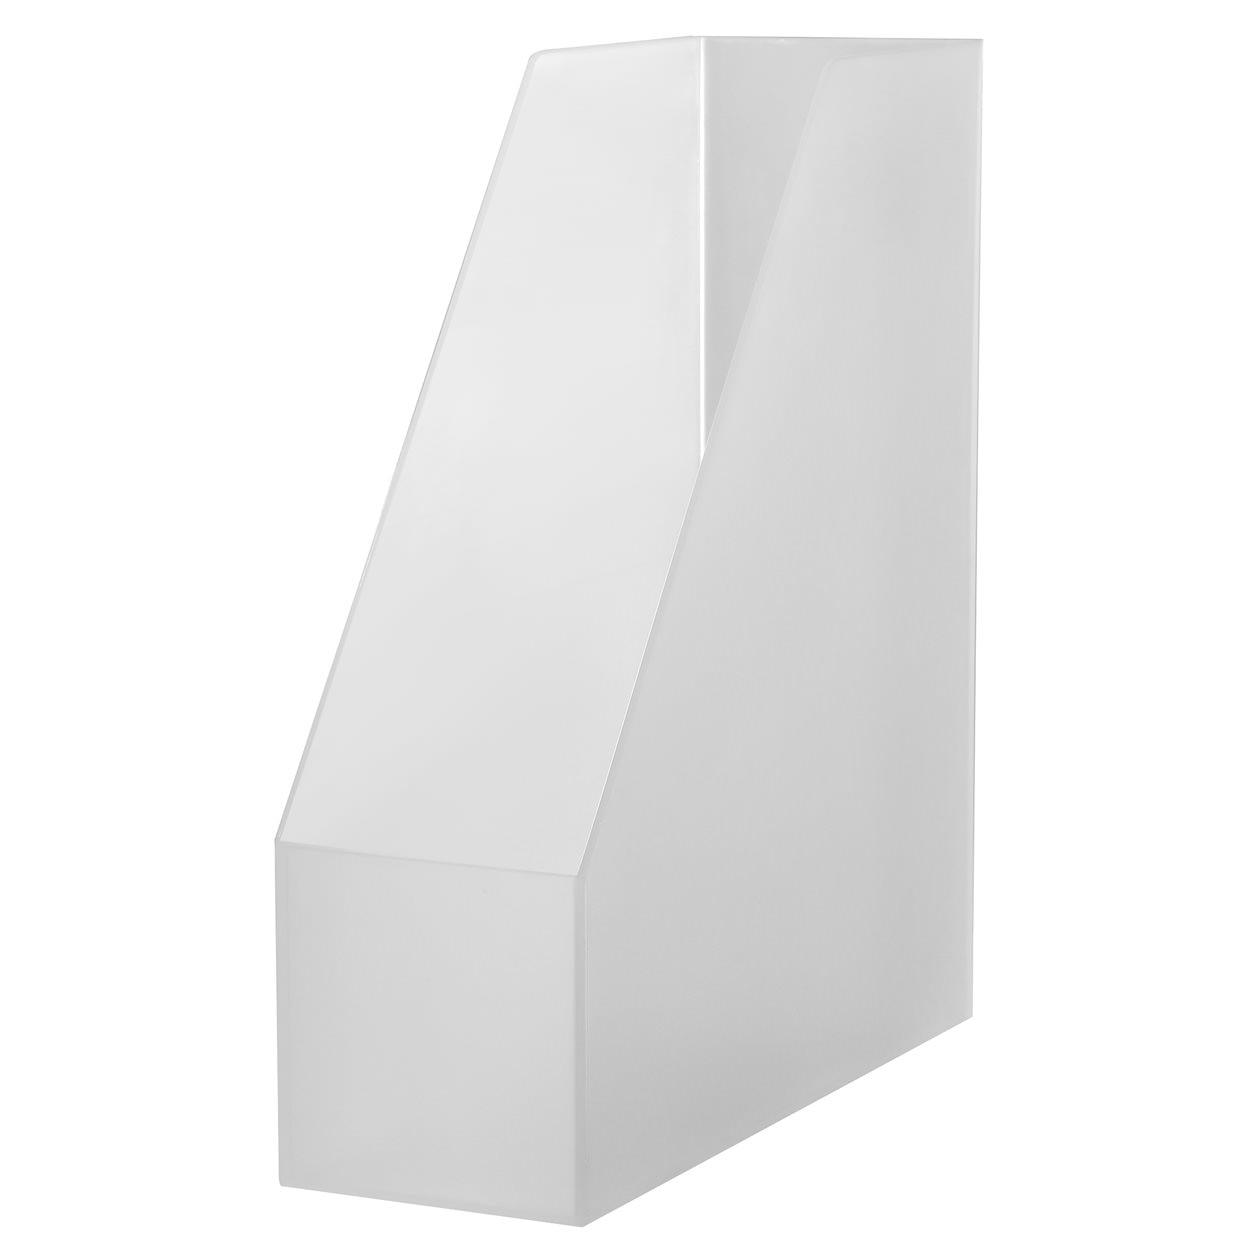 RoomClip商品情報 - ポリプロピレンスタンドファイルボックス・A4用 透過